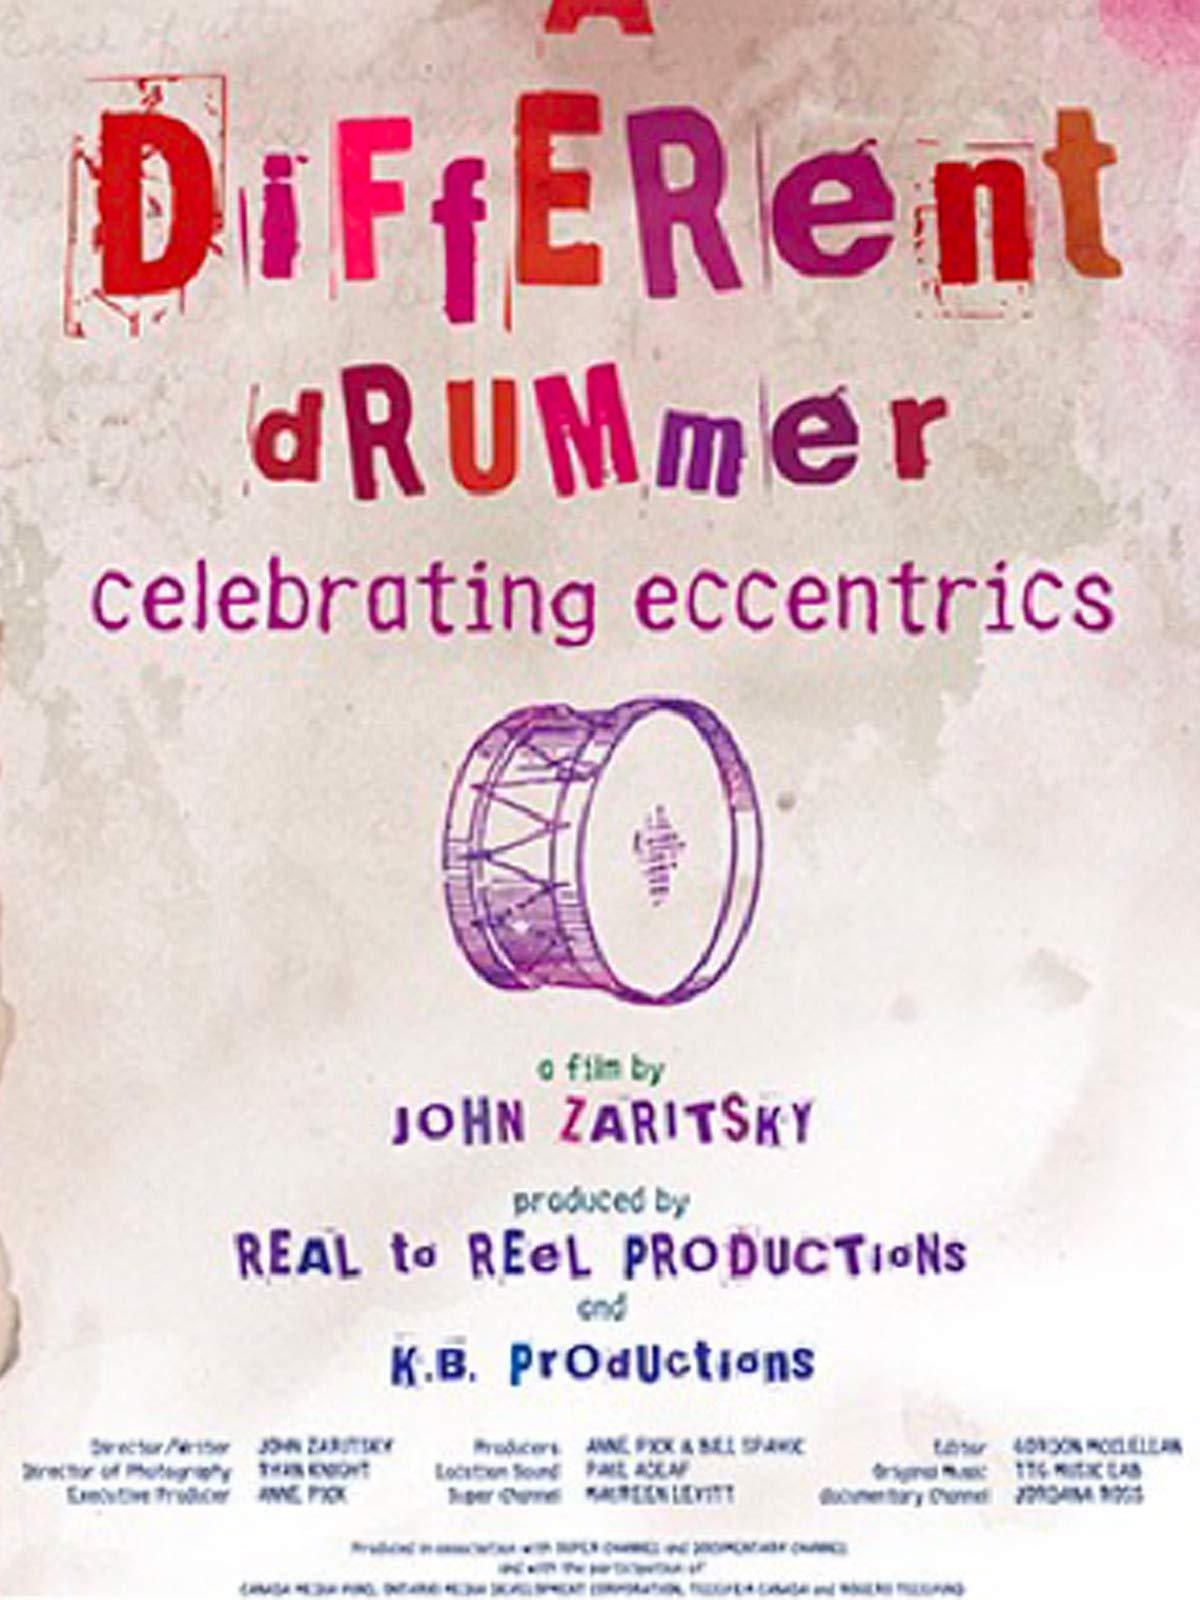 A Different Drummer - Celebrating Eccentrics